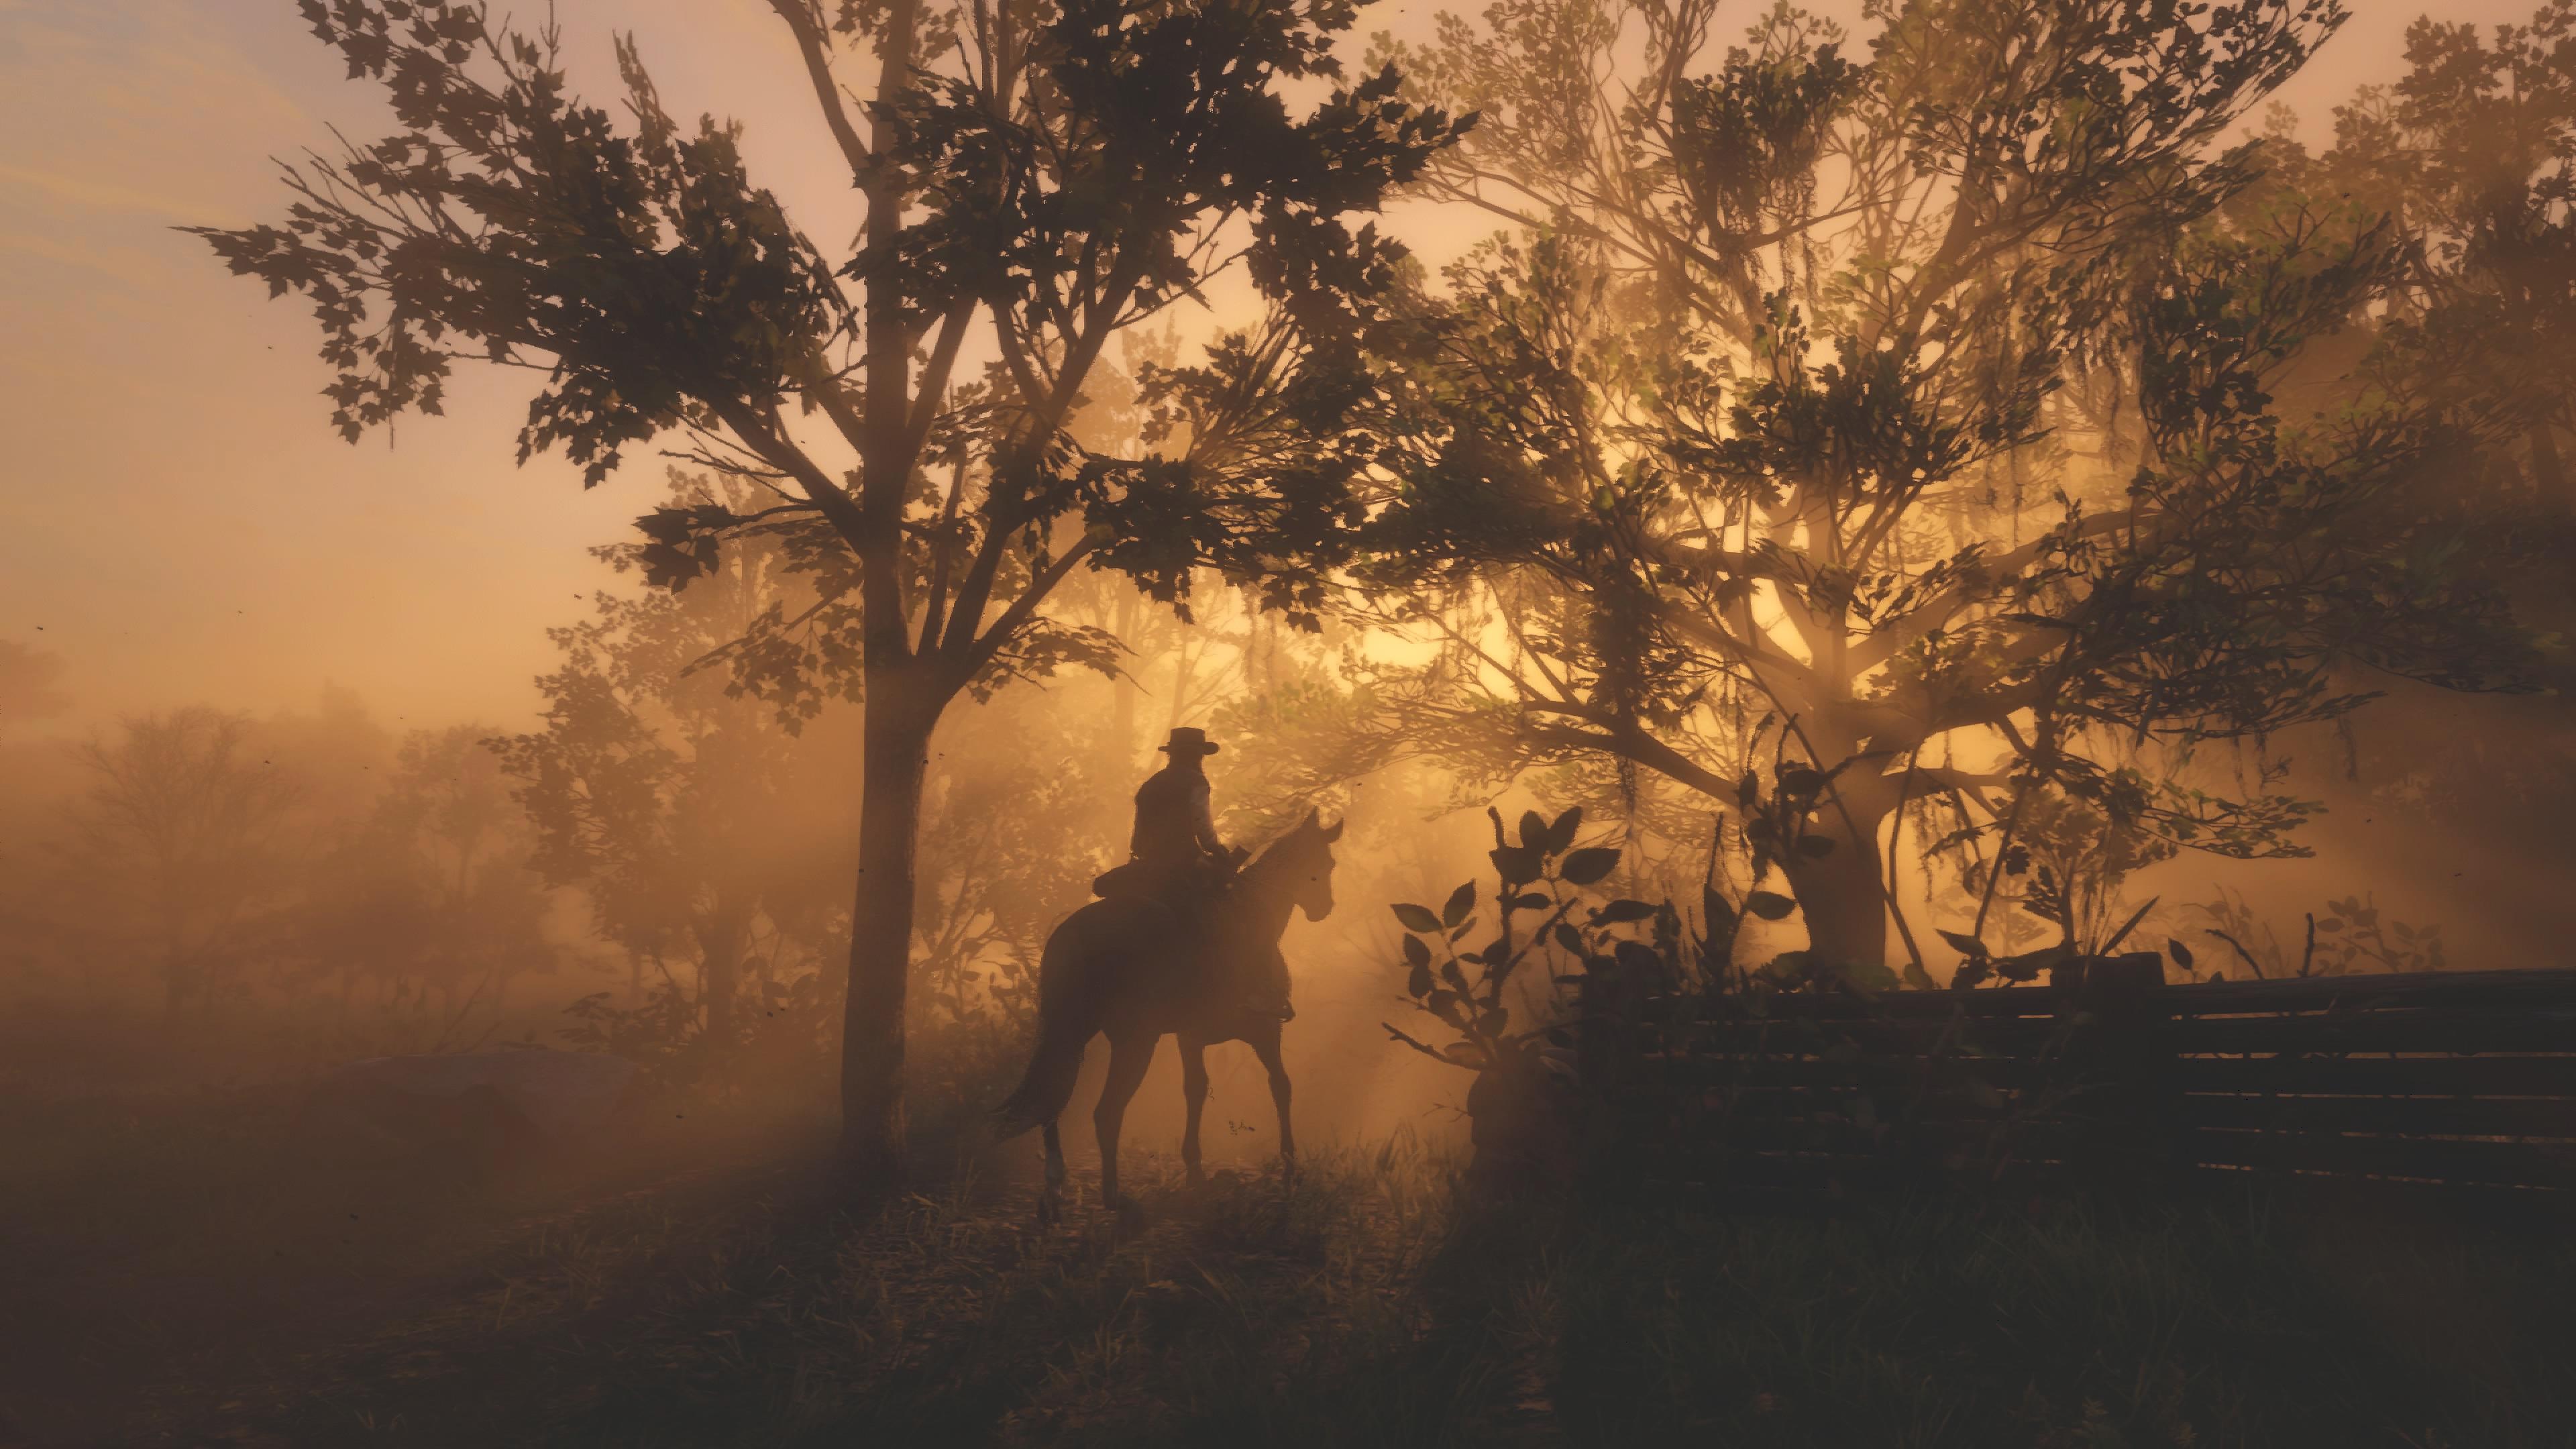 Red Dead Redemption 4k 2, HD Games, 4k Wallpapers, Images ...